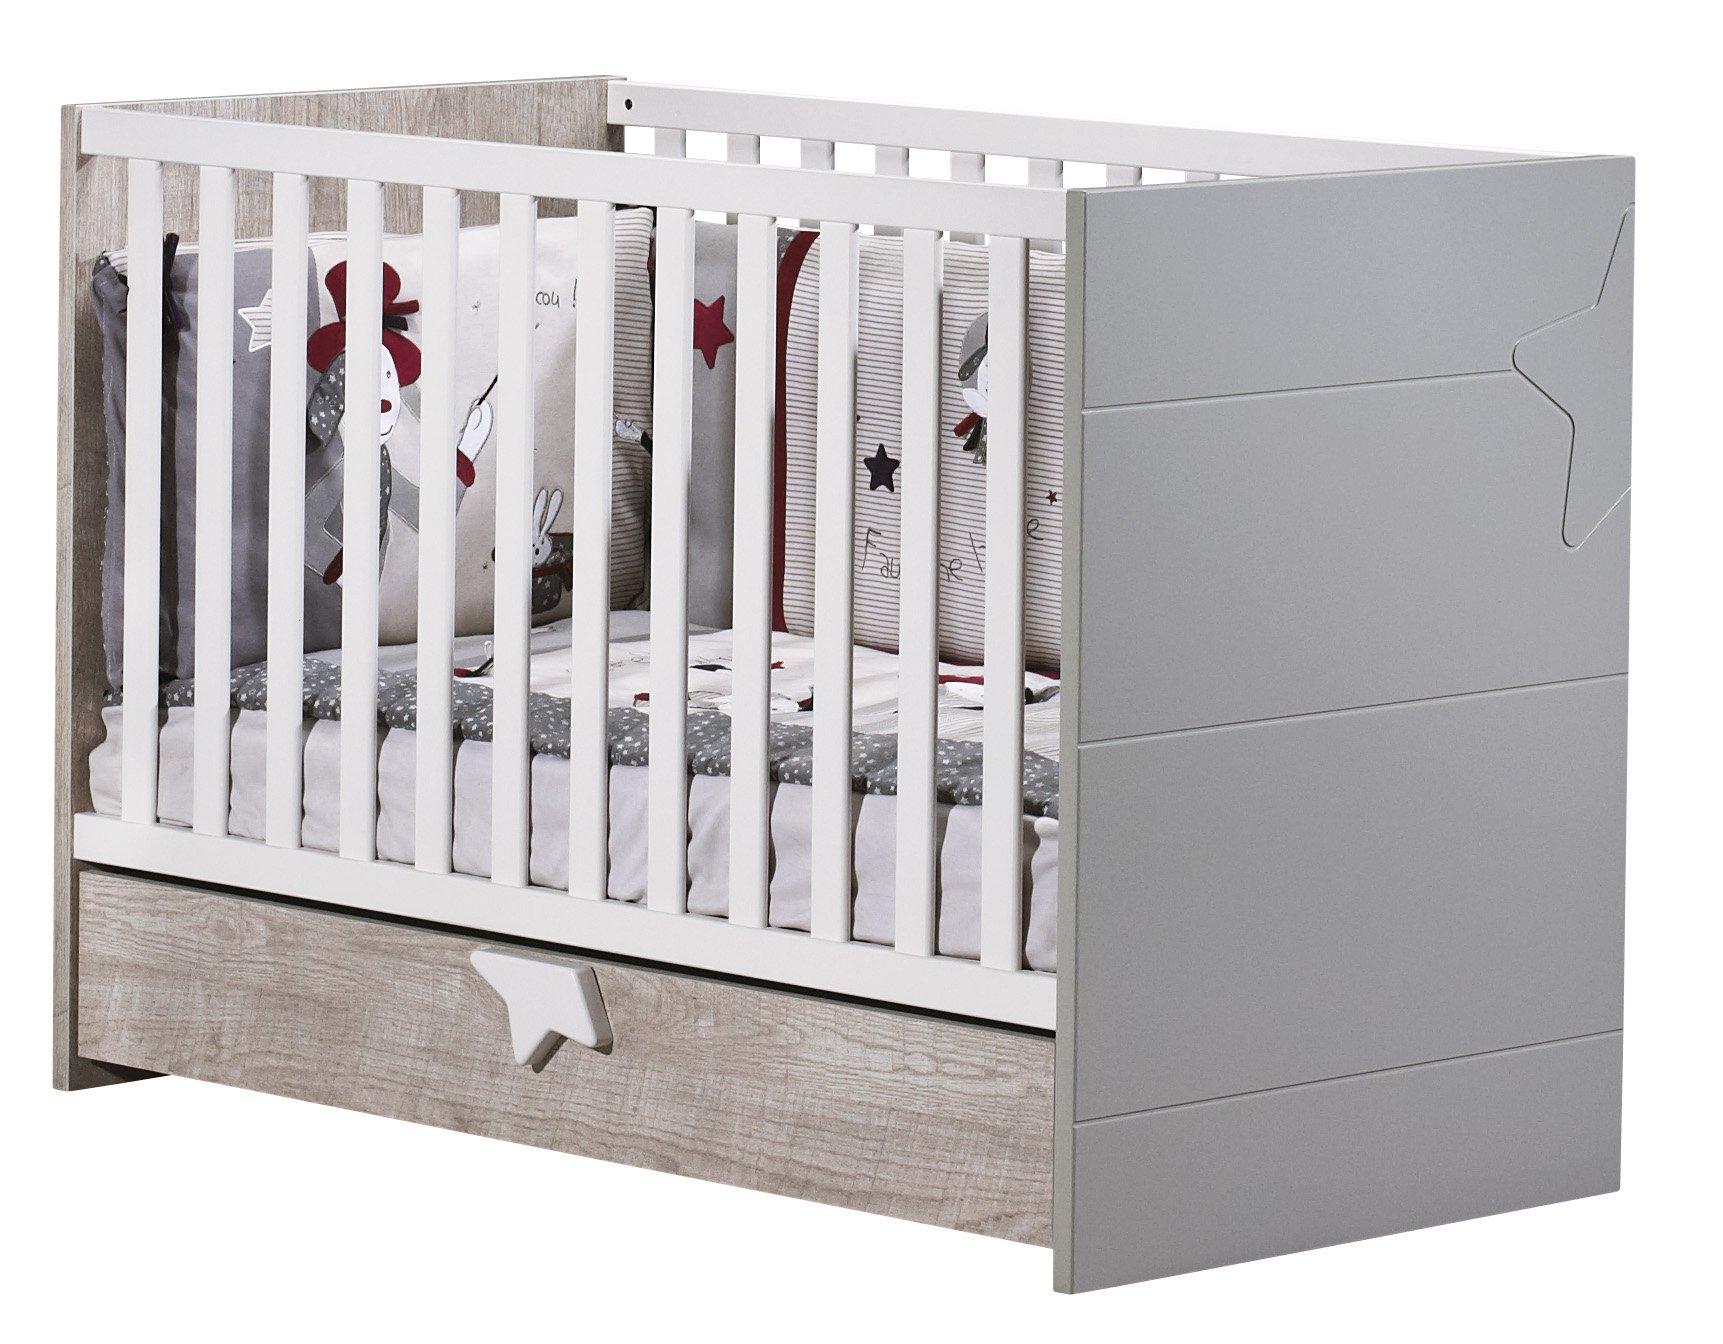 Sauthon meubles lit b b 60 x 120 nova made in b b - Lit bebe barriere coulissante ...